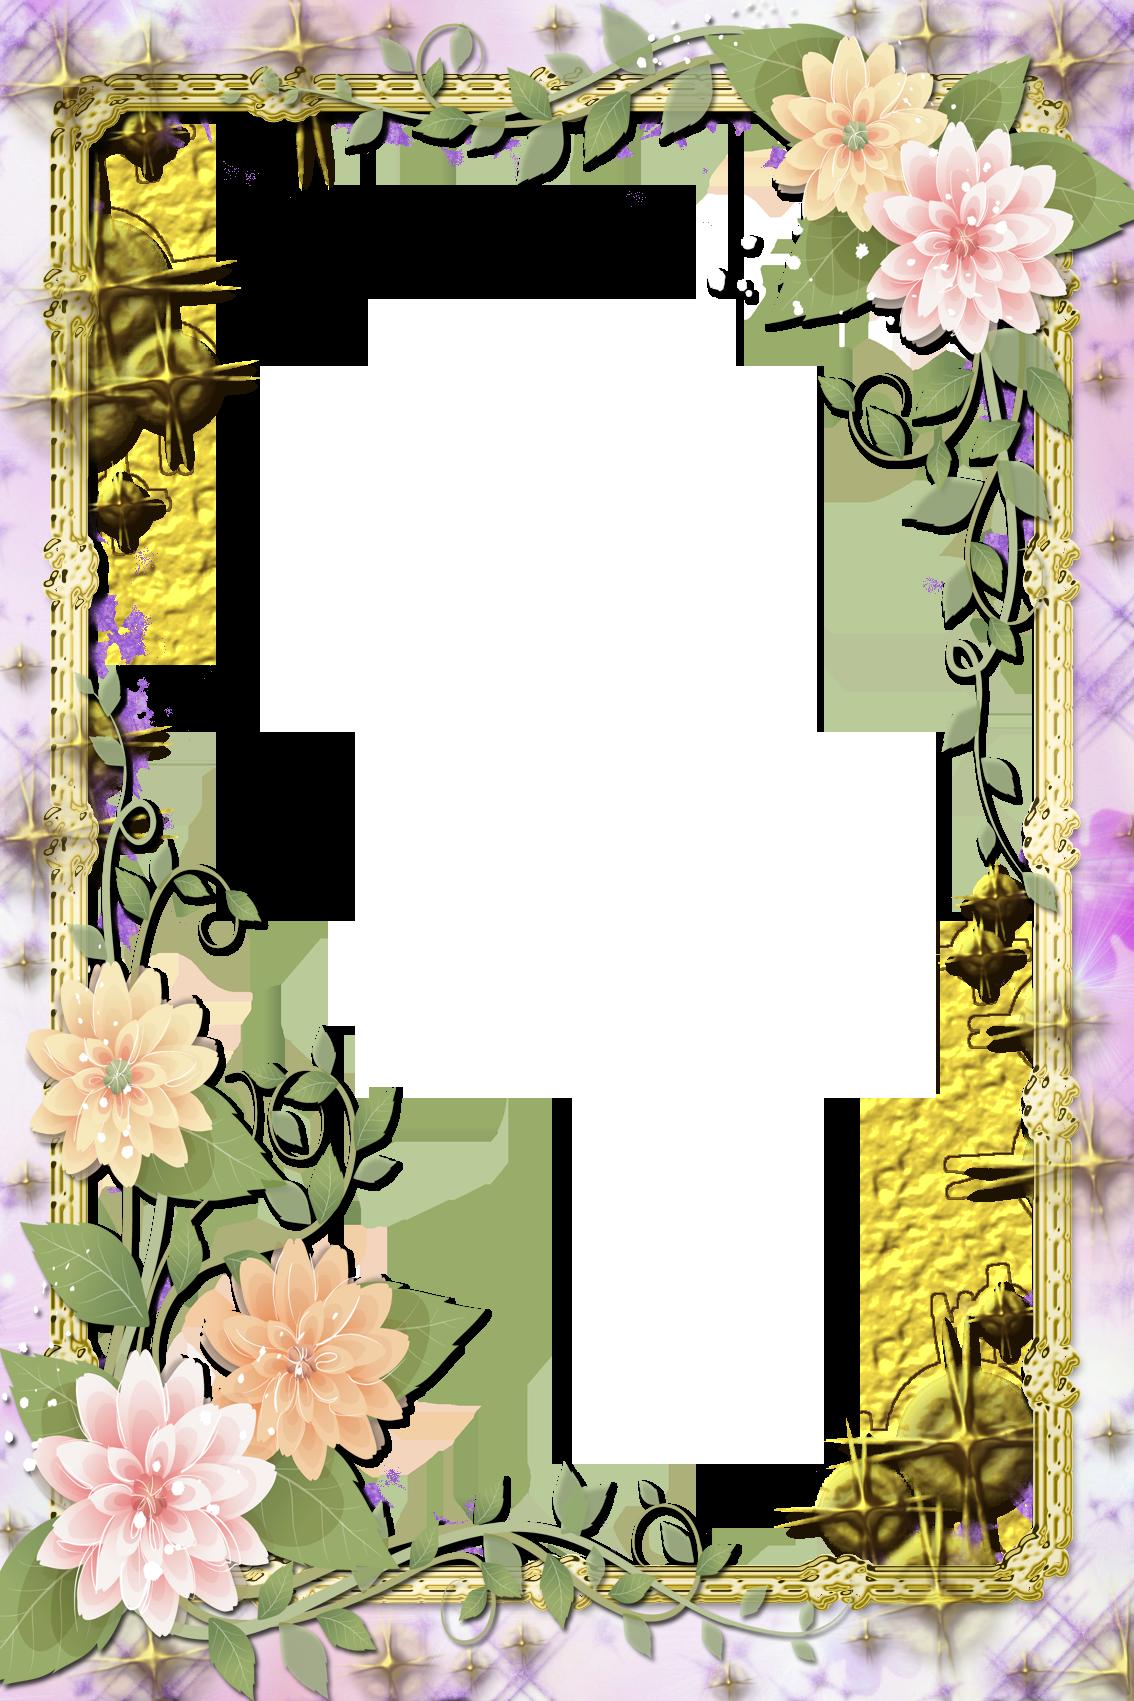 Transparent Flowers Frame.